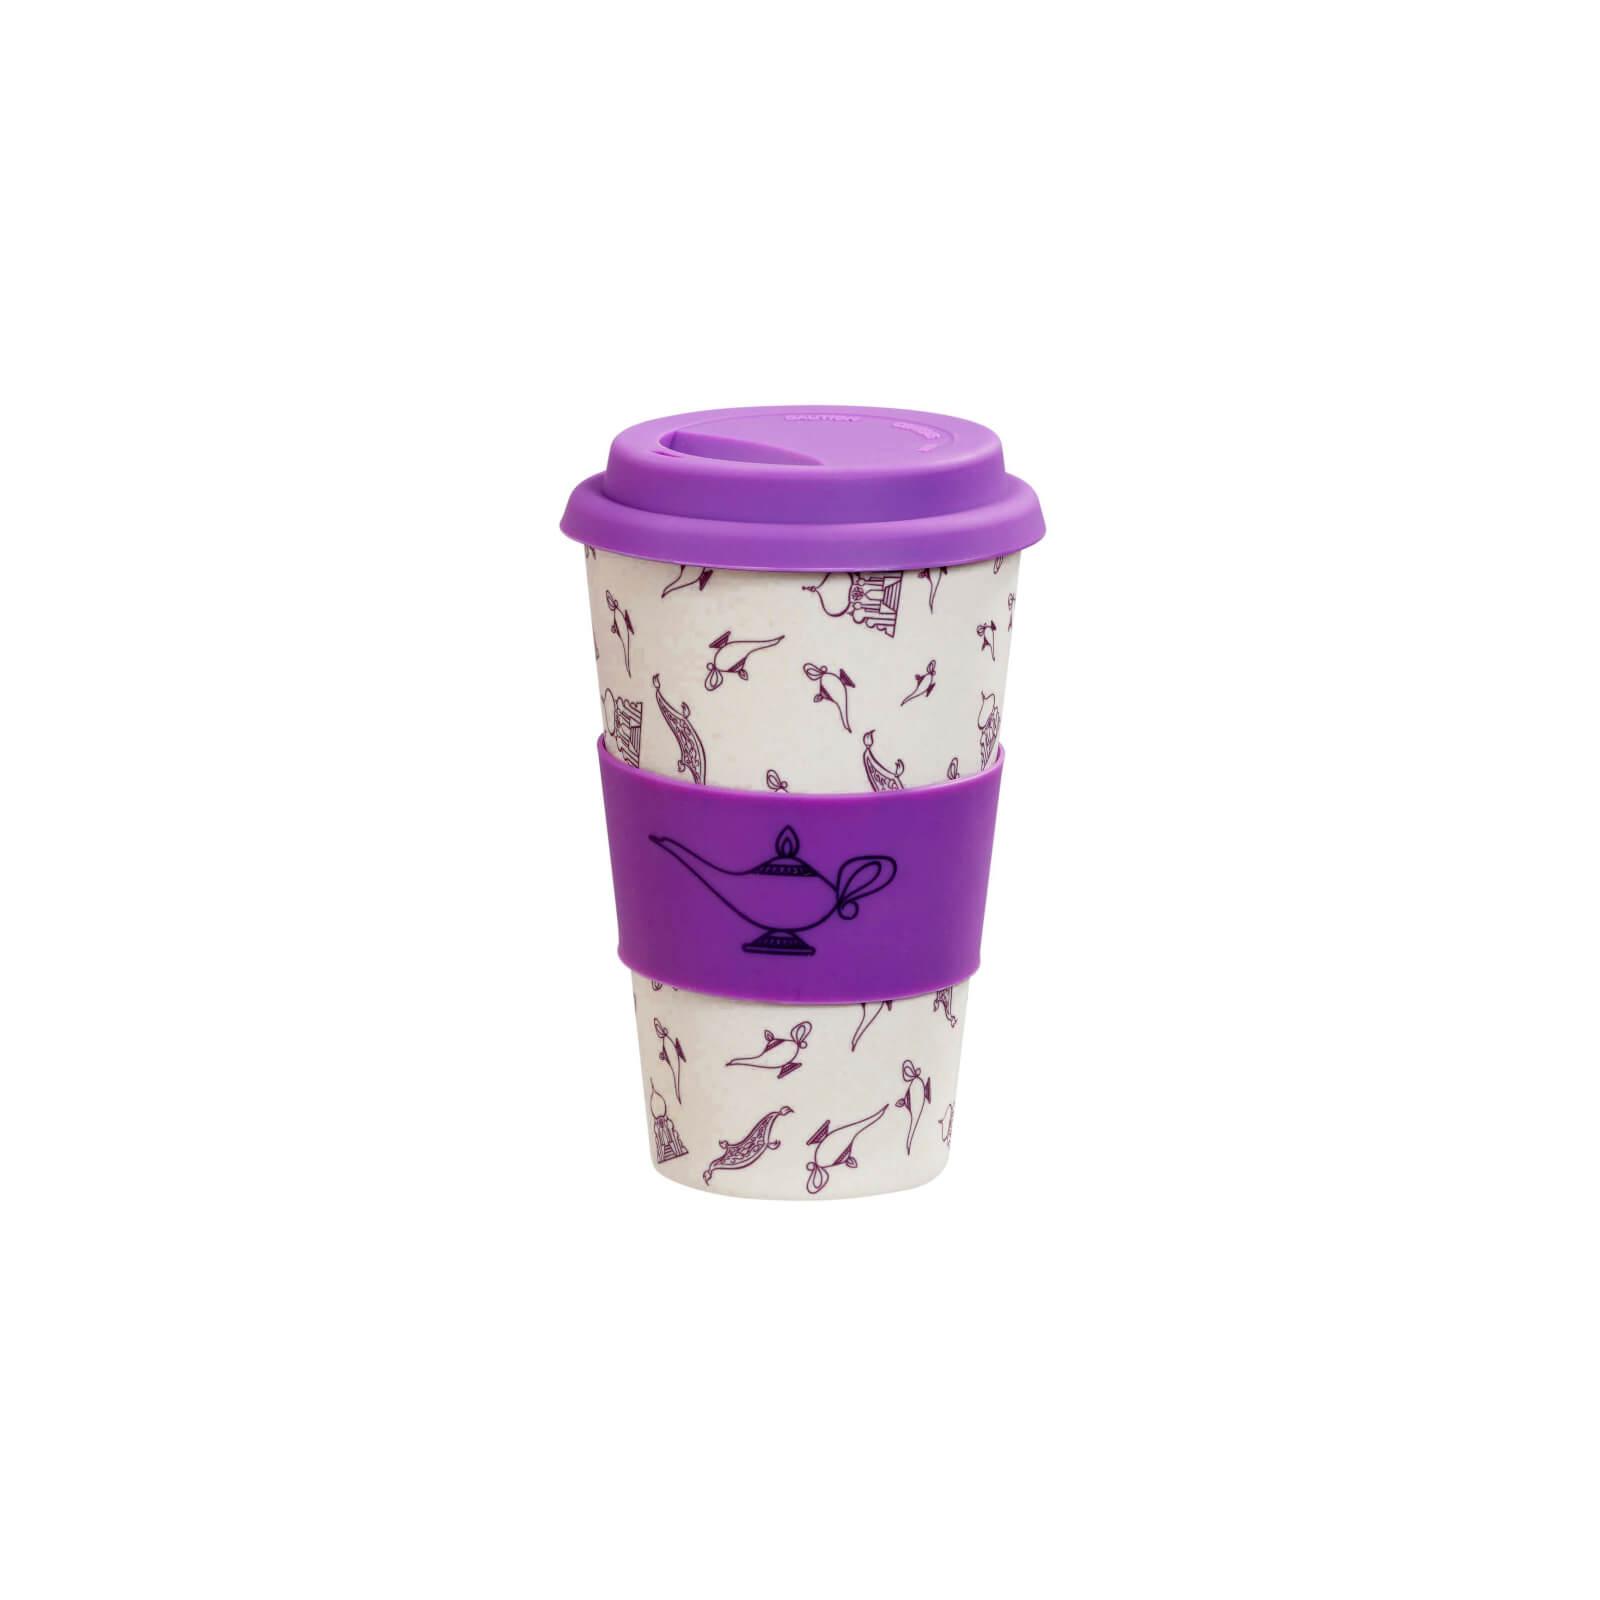 Image of Funko Homeware Disney Colour Block Bamboo Lidded Mug A Whole New World